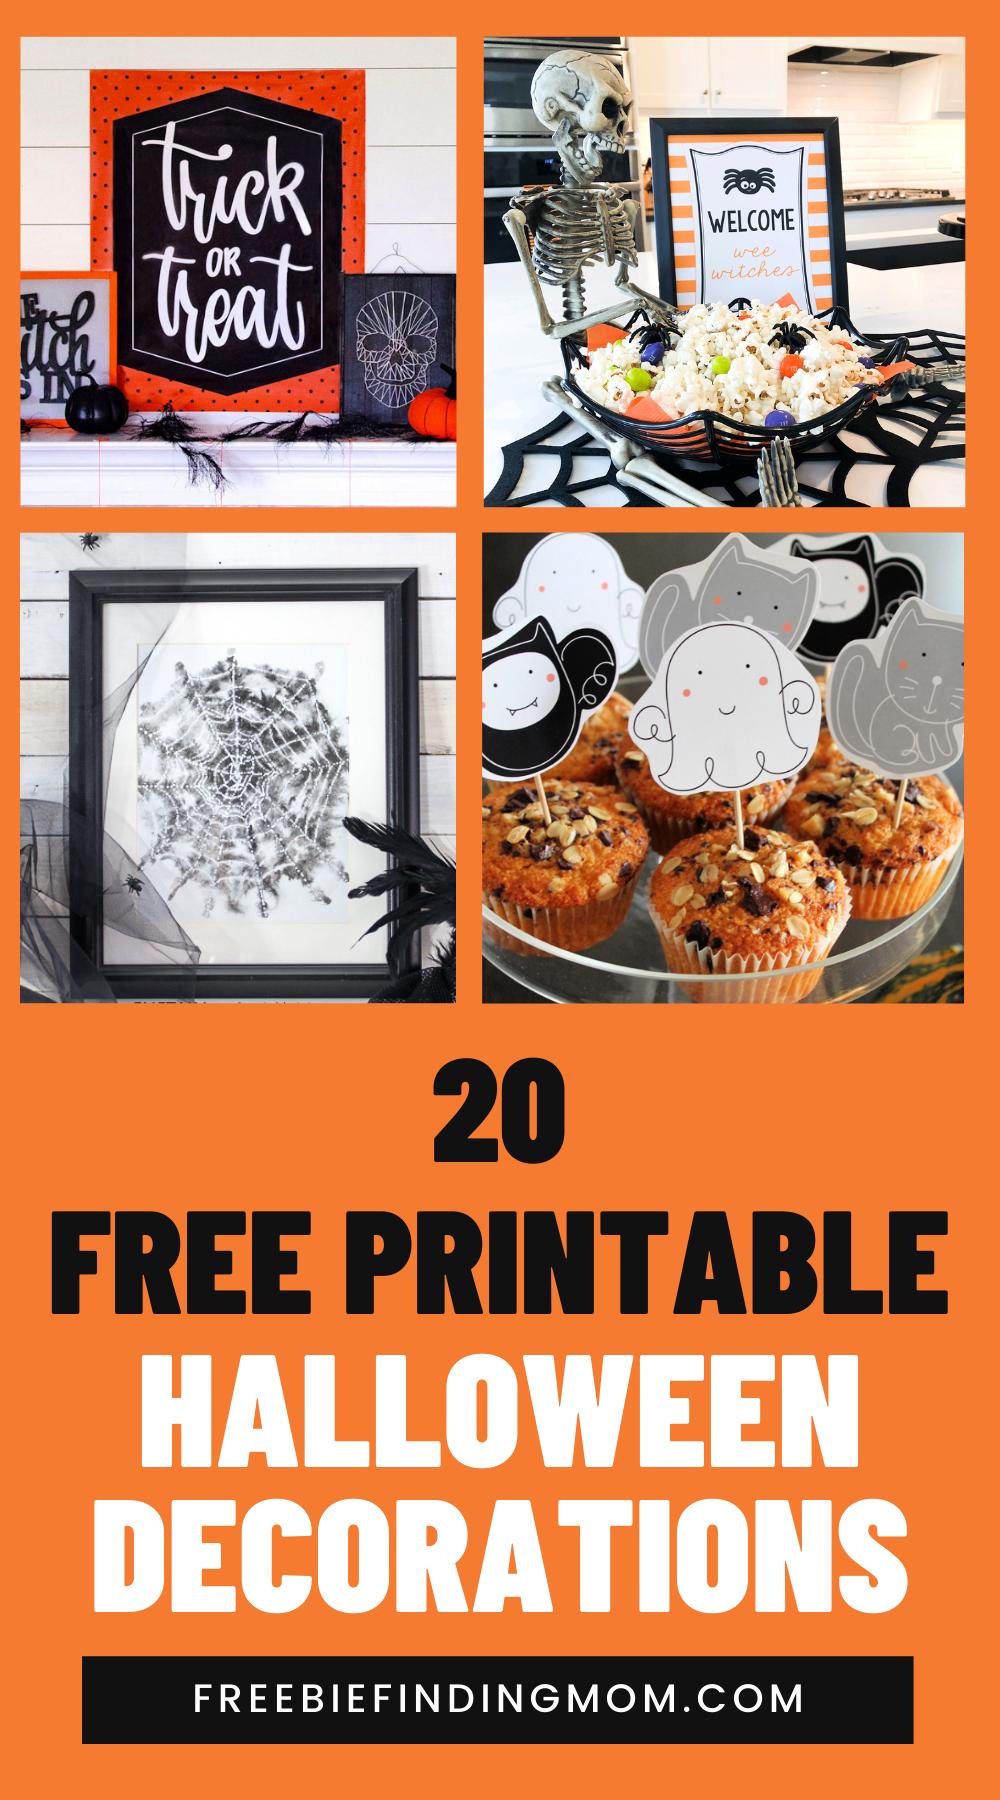 20 Free Printable Halloween Decorations Printable Halloween Decorations Halloween Printables Free Printables Kids